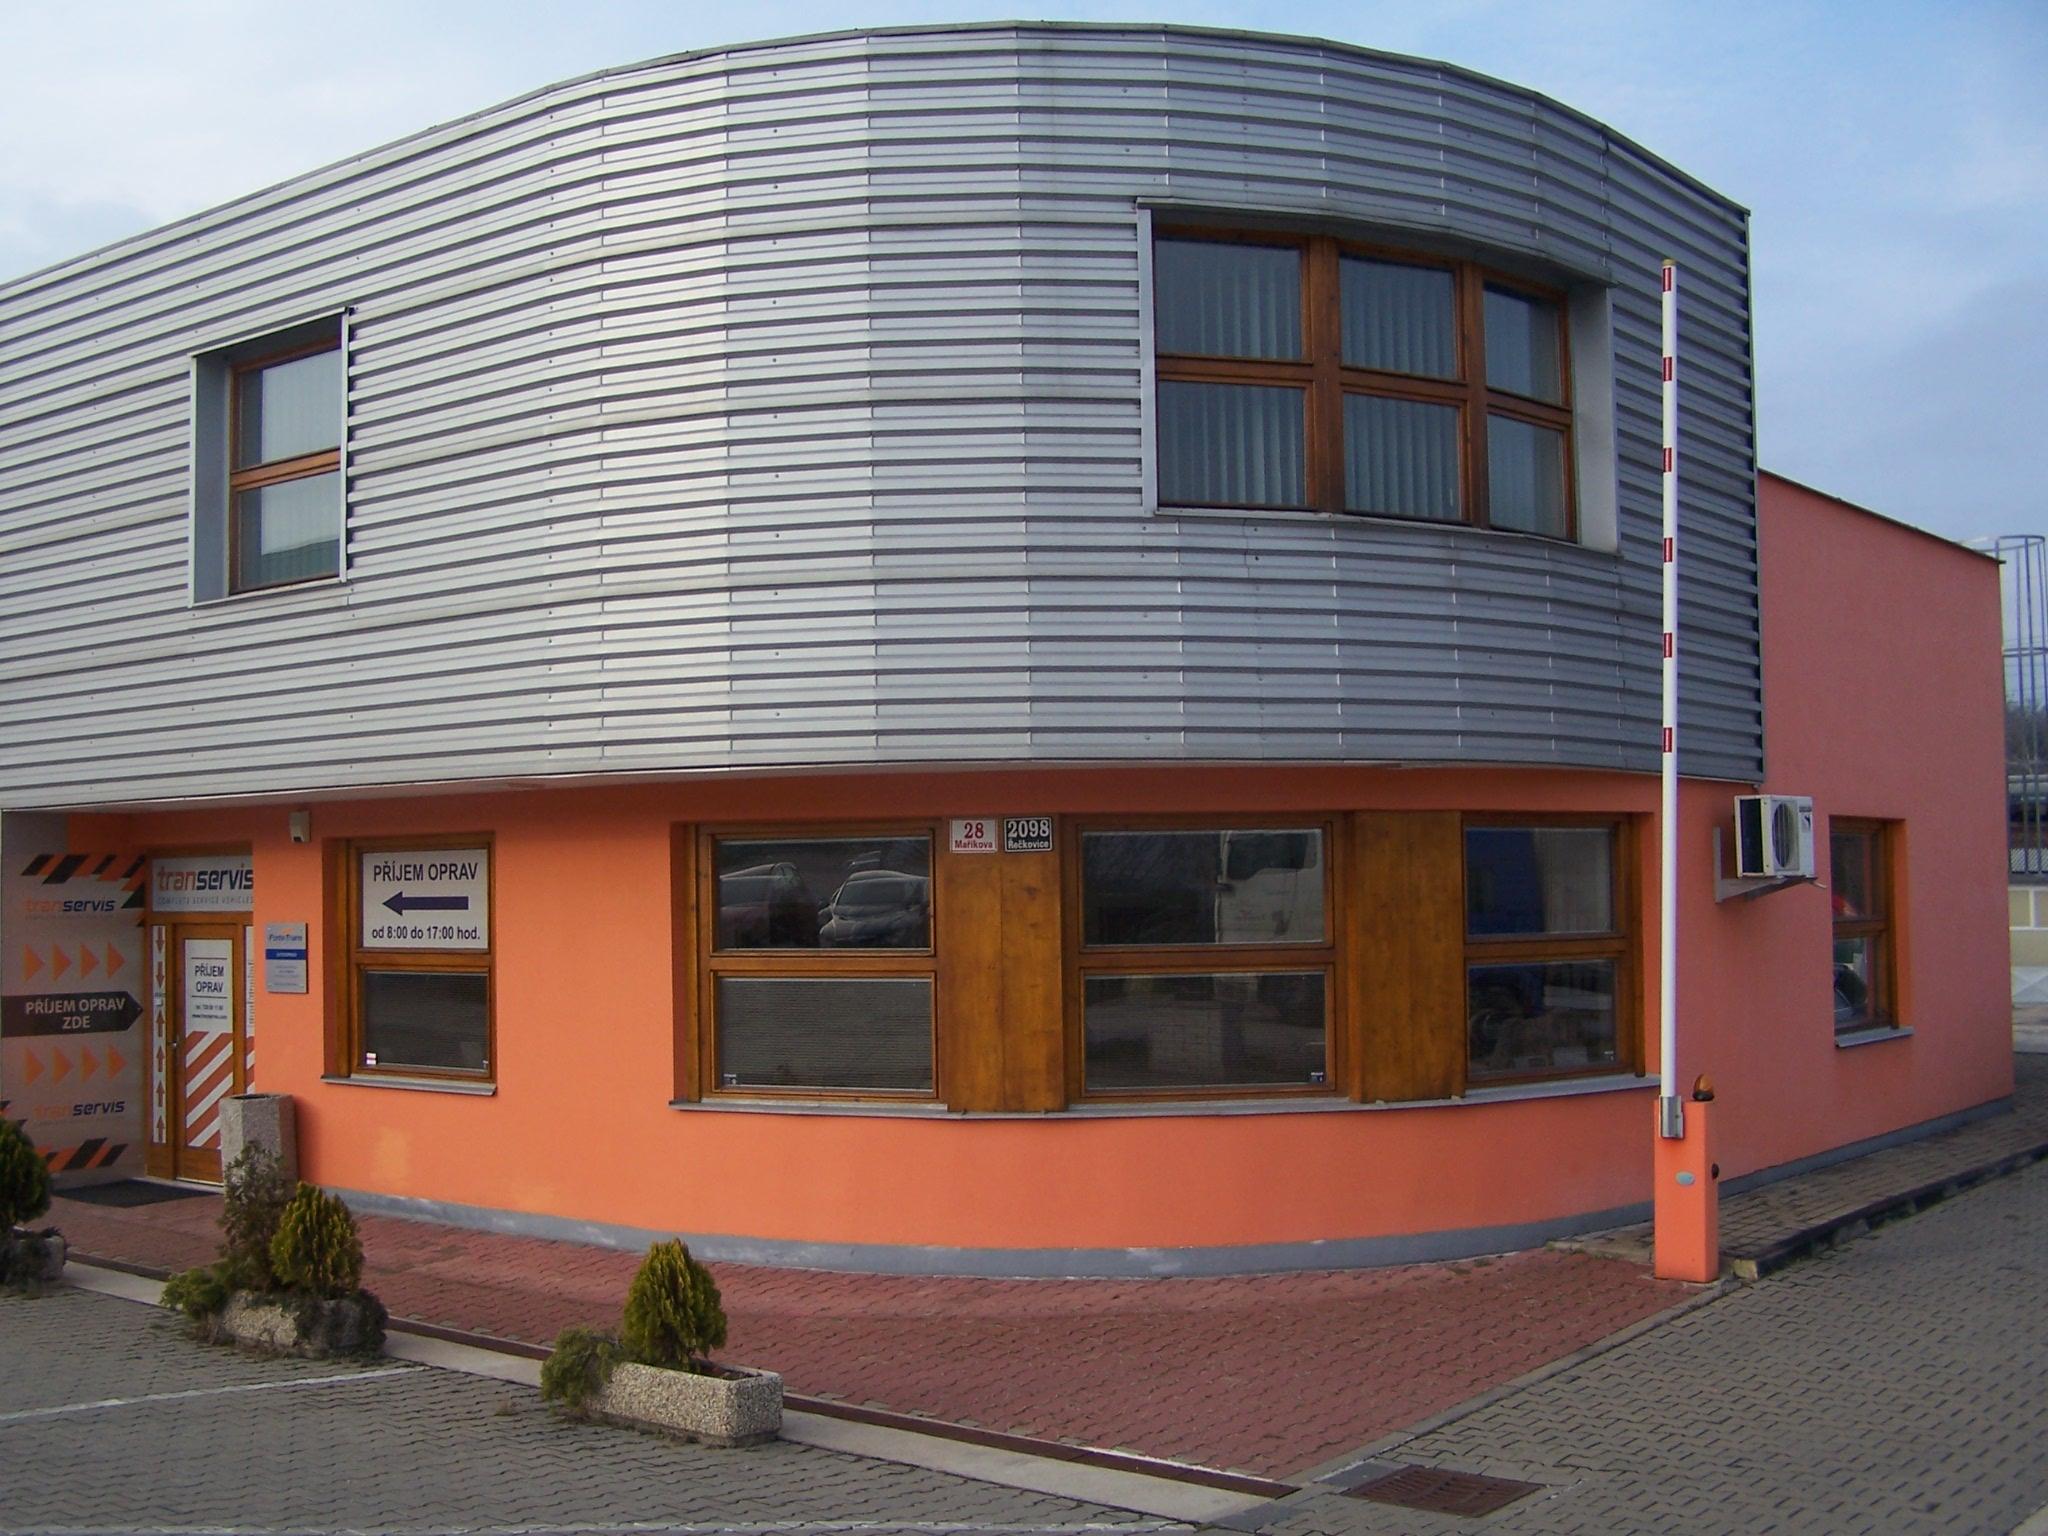 http://www.cesko-katalog.cz/galerie/transervis-s-r-o-1427384532.